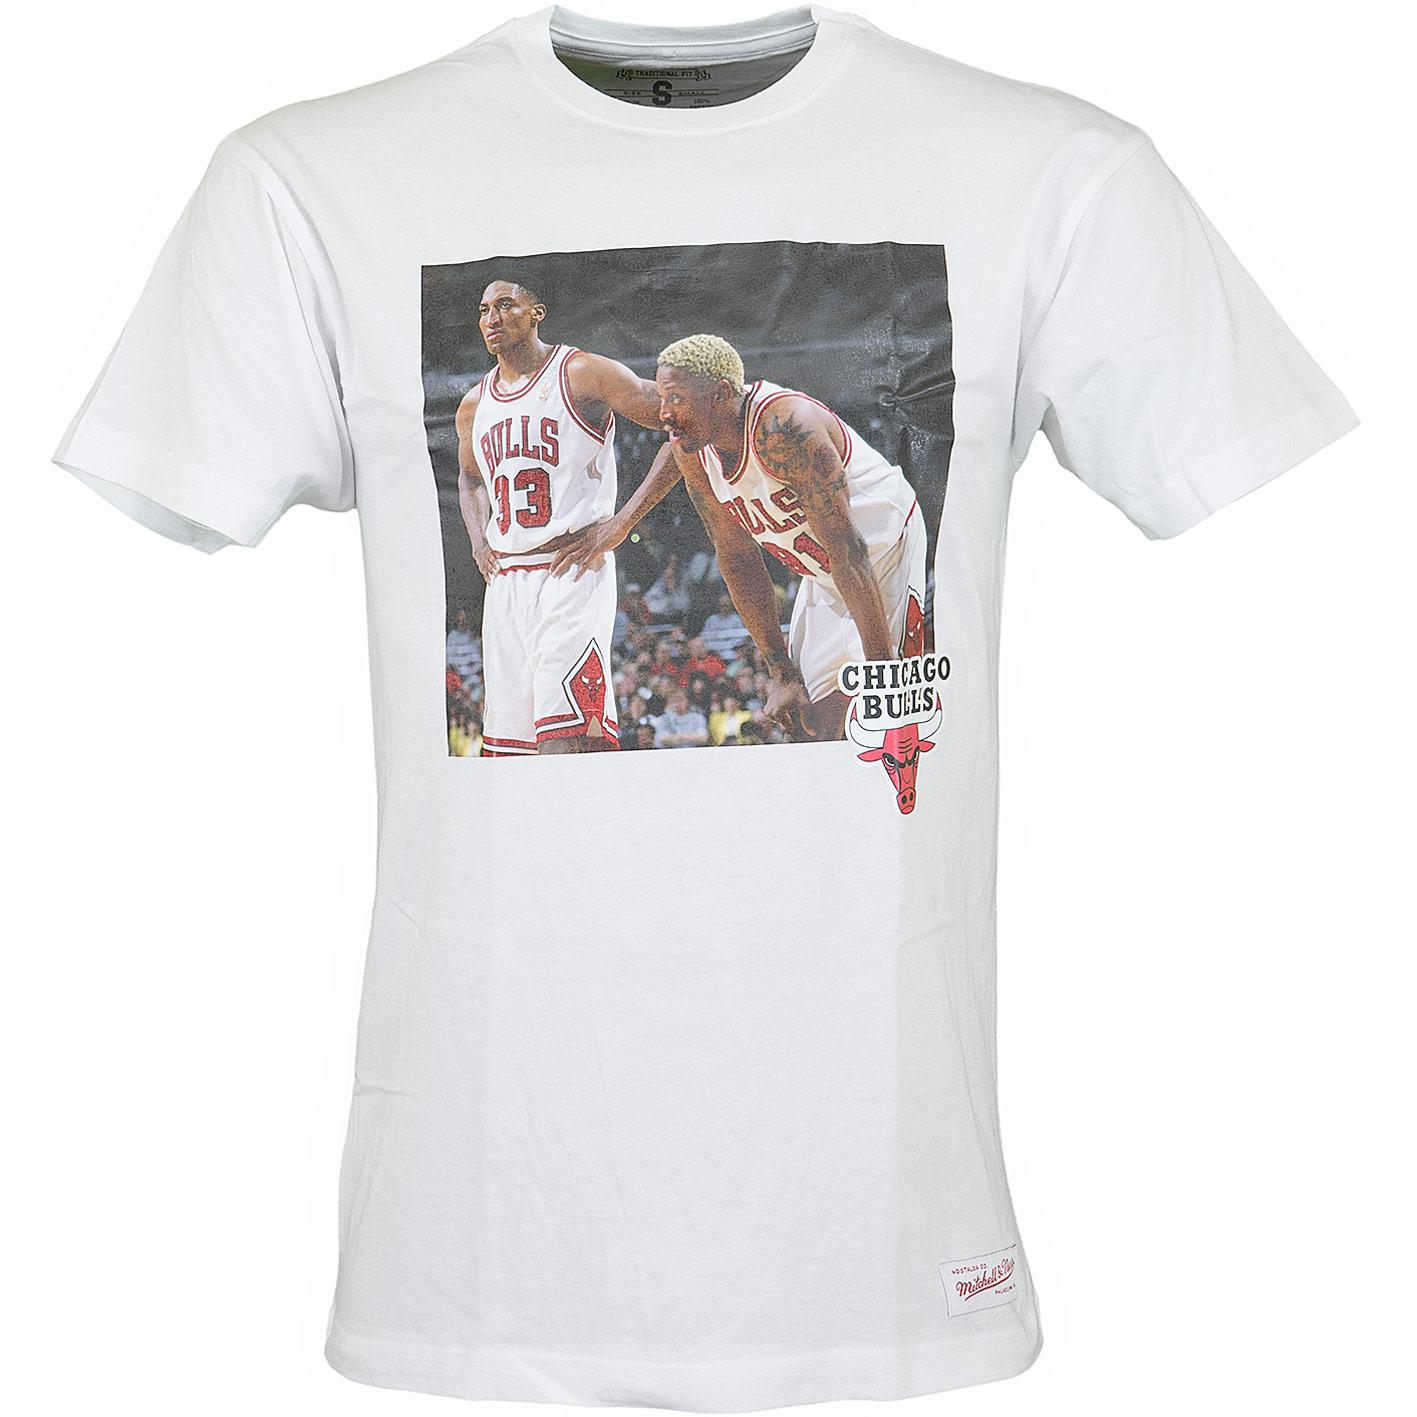 buy online f84db cce3f Mitchell & Ness T-Shirt Chicago Bulls Pippen & Rodman weiß